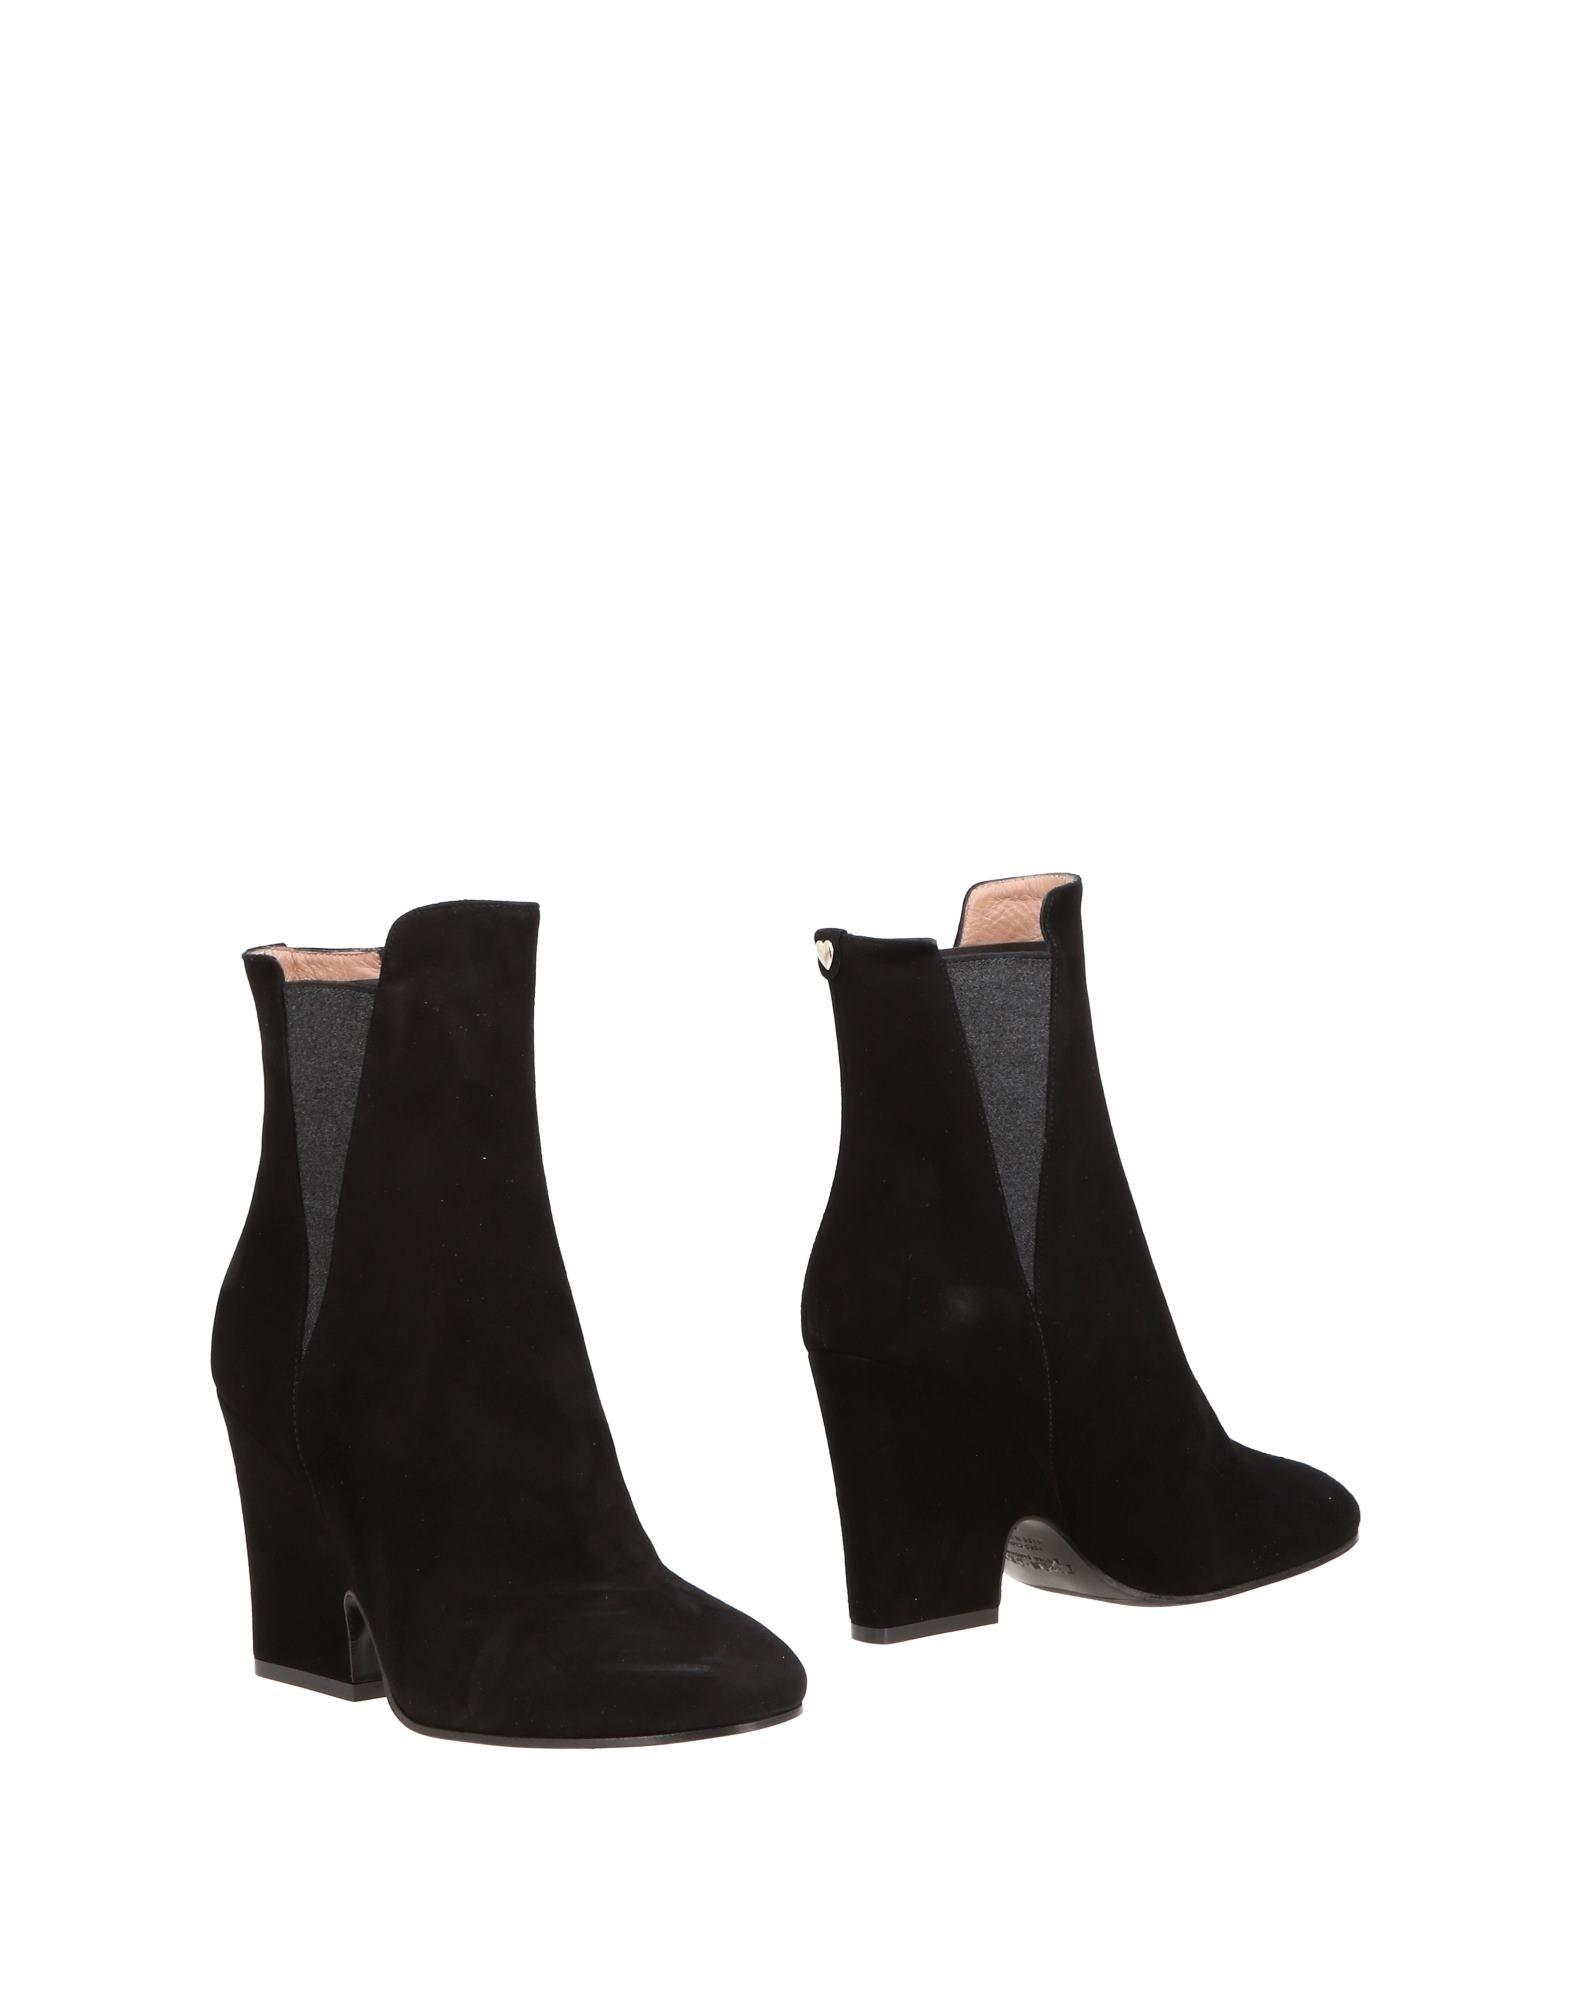 Stilvolle billige Schuhe Schuhe Schuhe Twin 11368350VL f13b4c